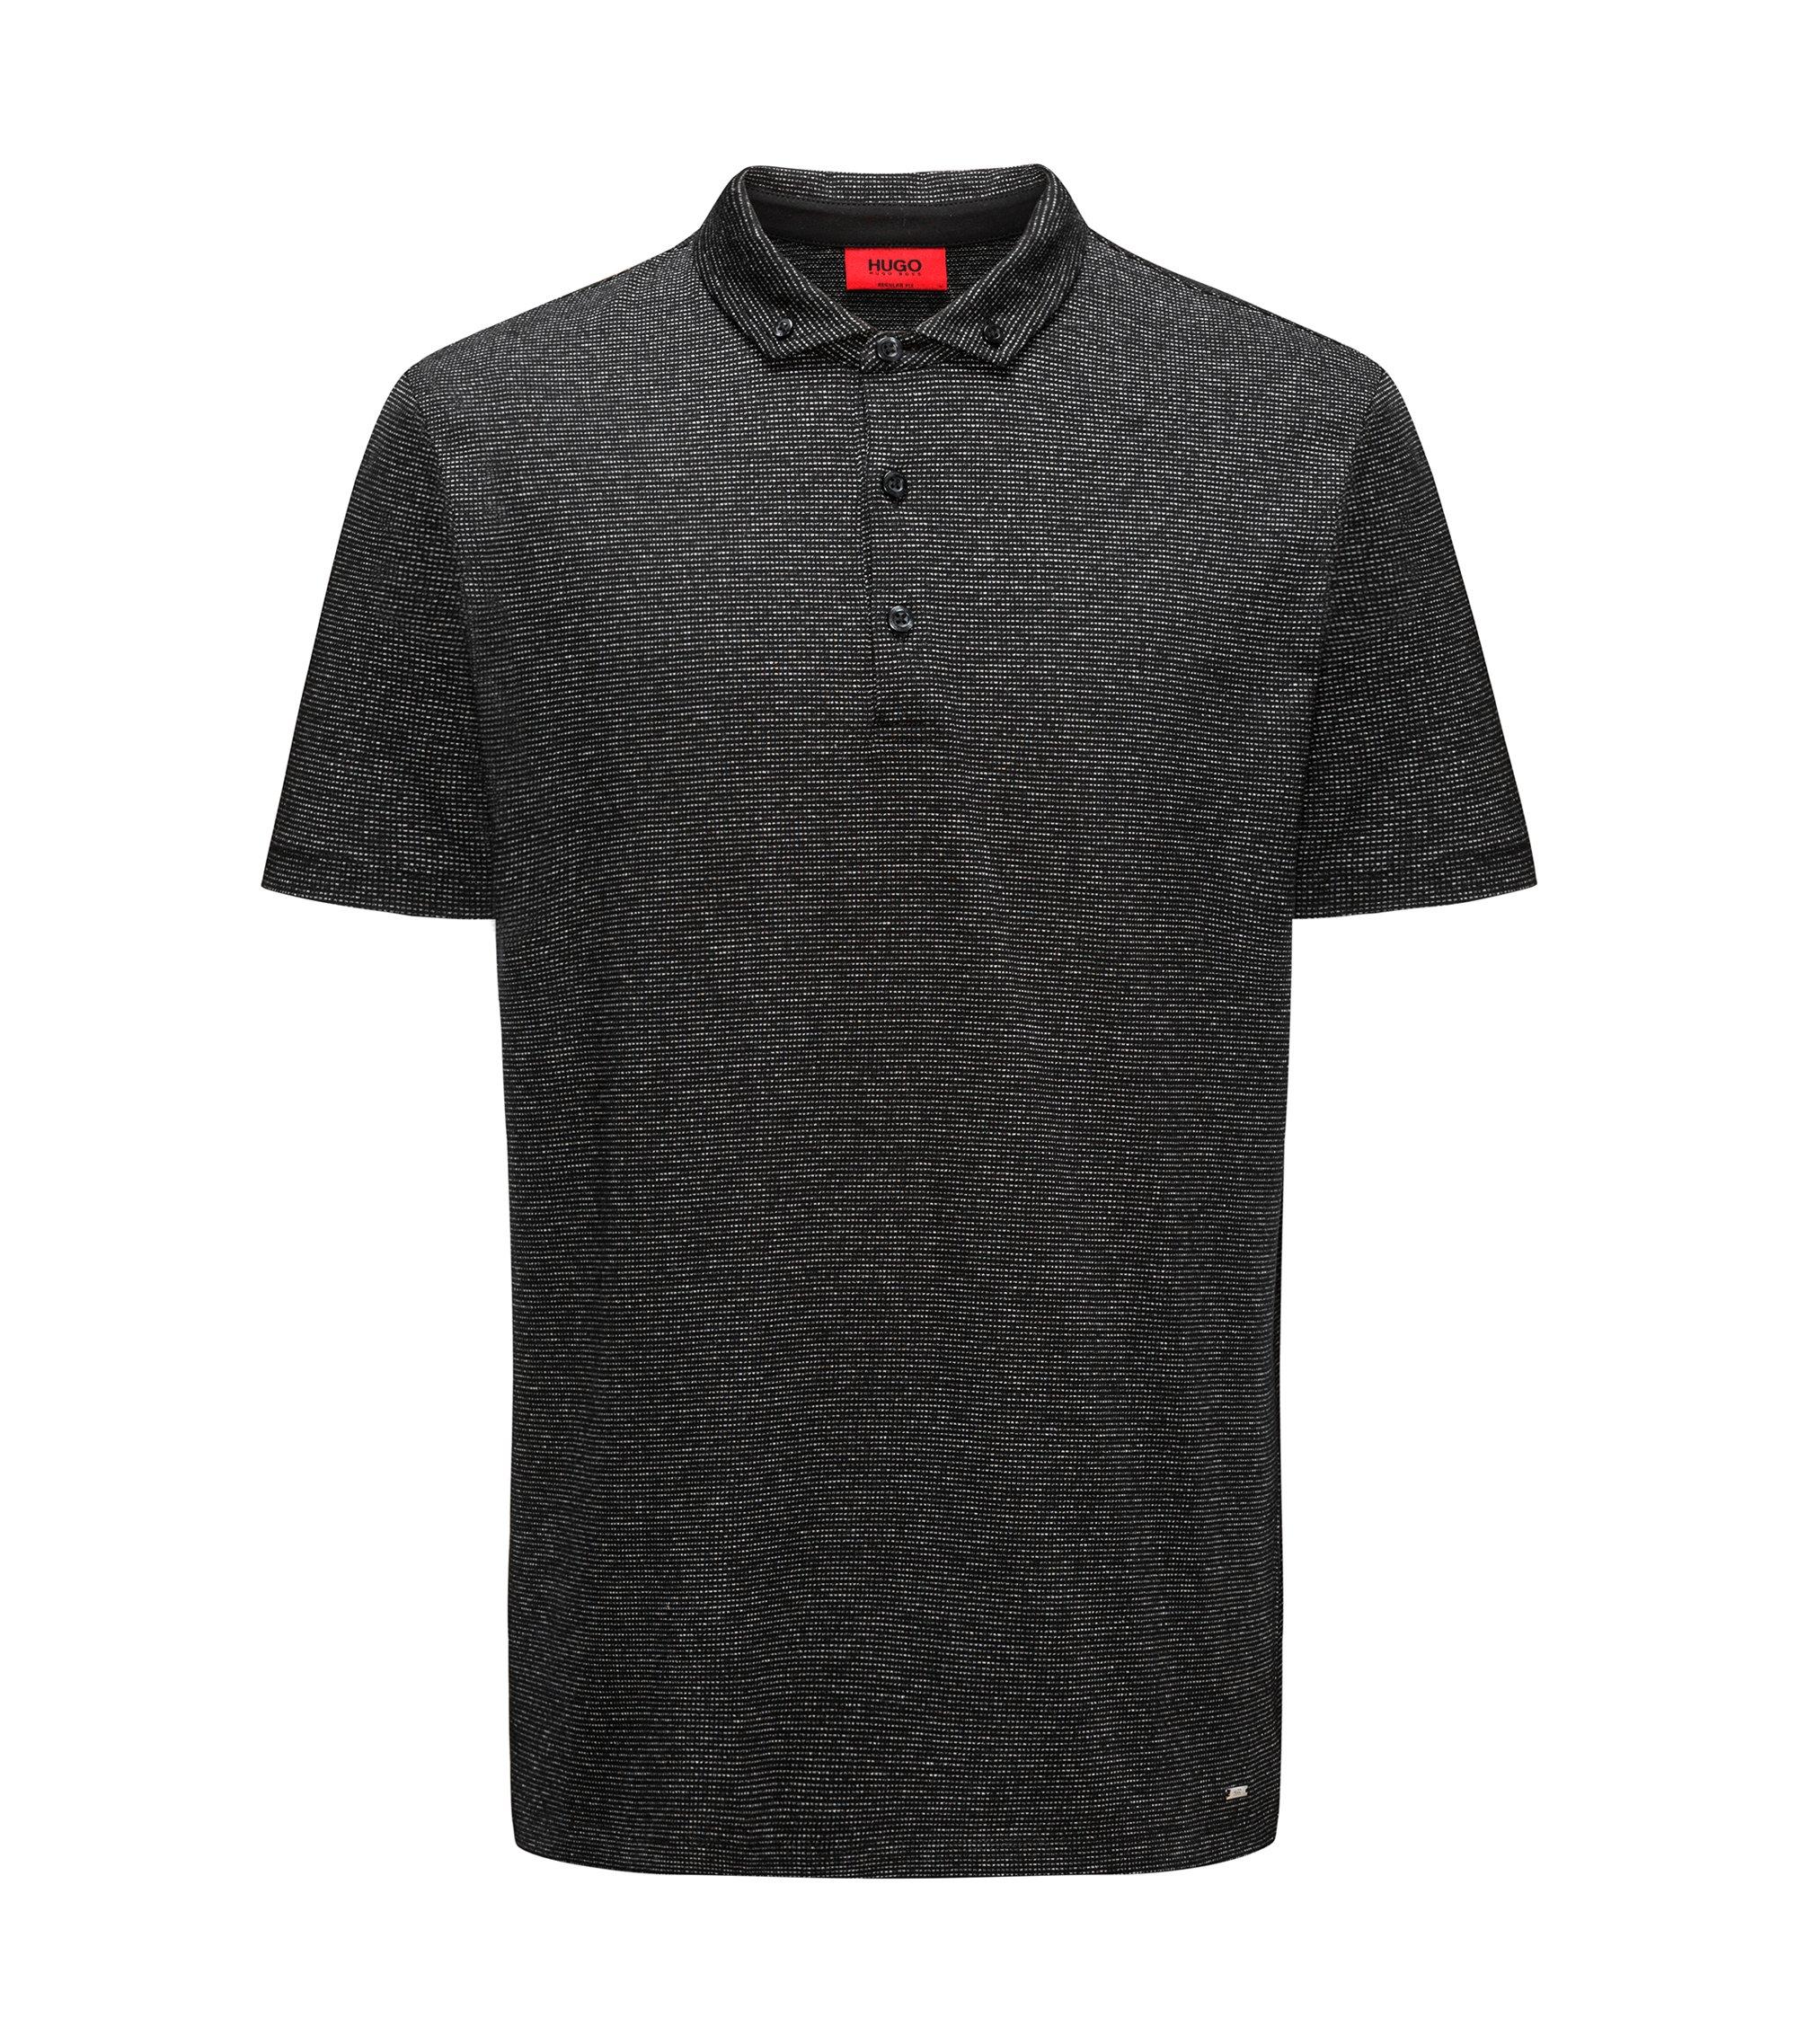 Cotton Blend Polo Shirt, Regular Fit | Deleton, Black